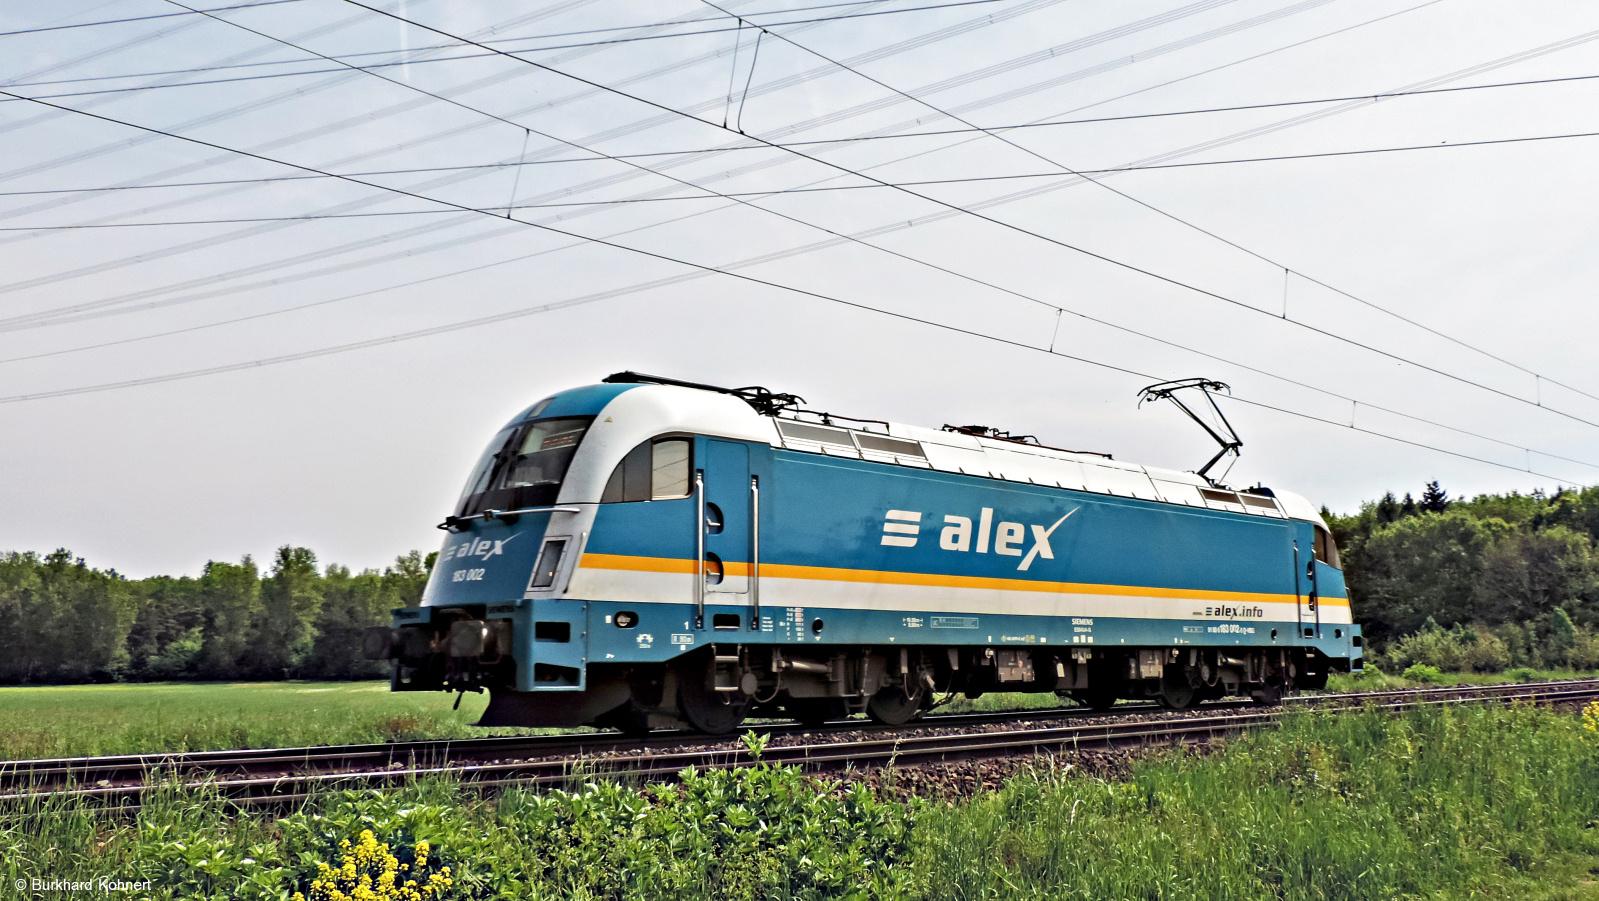 183 002 Alex